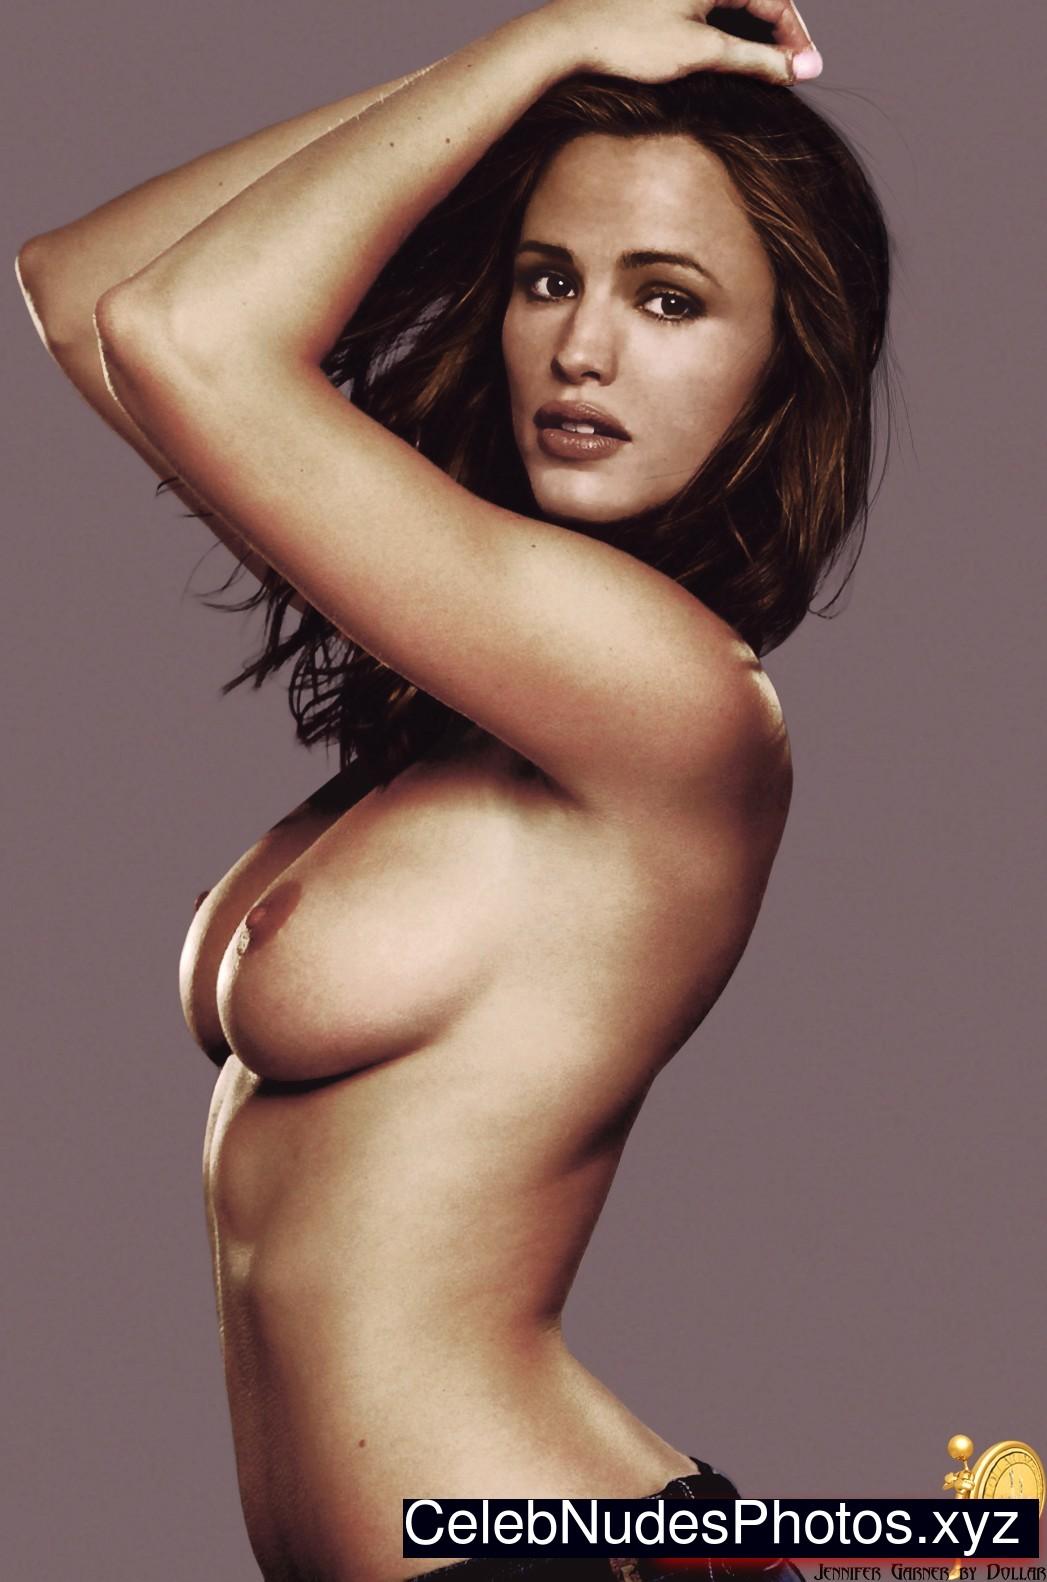 Jennifer Garner Free Nude Celeb sexy 20